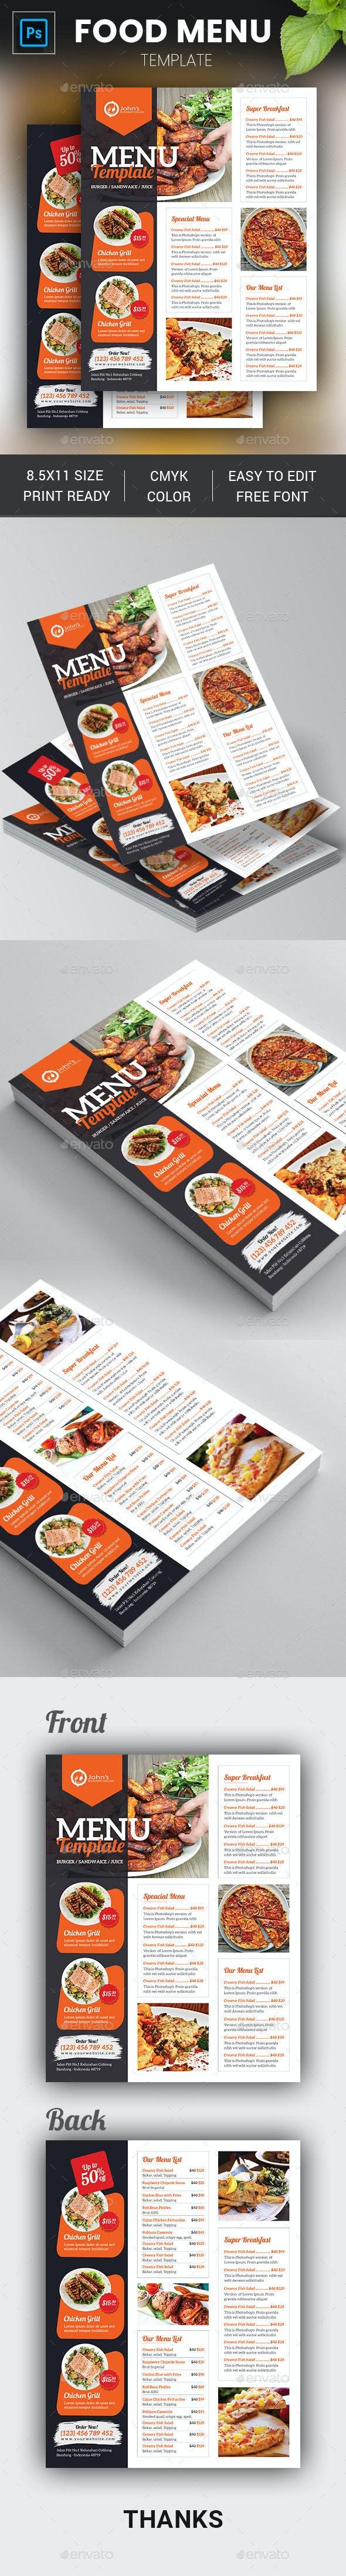 Food Menu Template - Restaurant Flyers